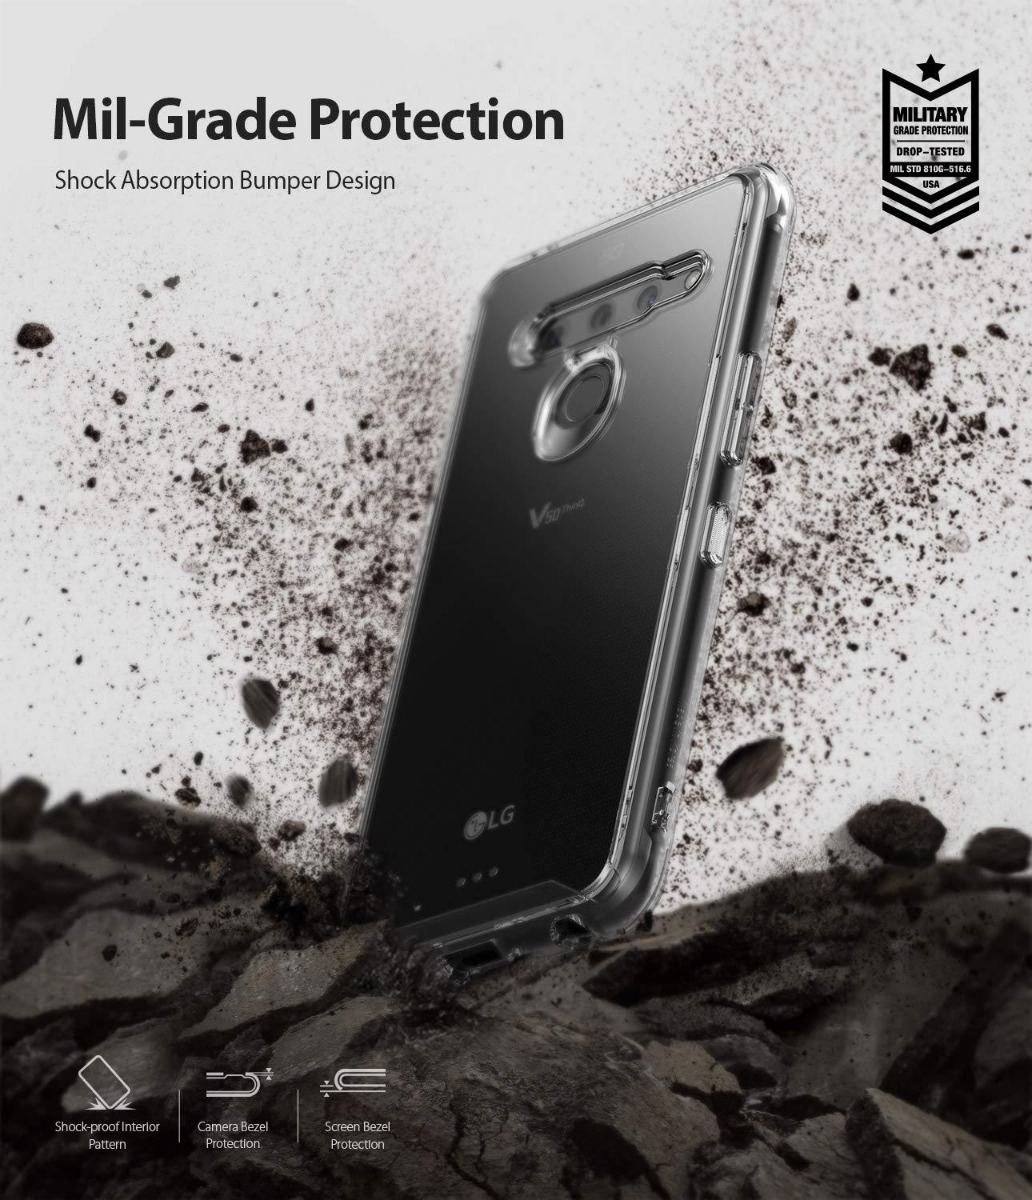 2a85e8d32ba Funda Case Ringke Fusion Para Lg V50 Thinq 5g Bumper - $ 429.00 en ...